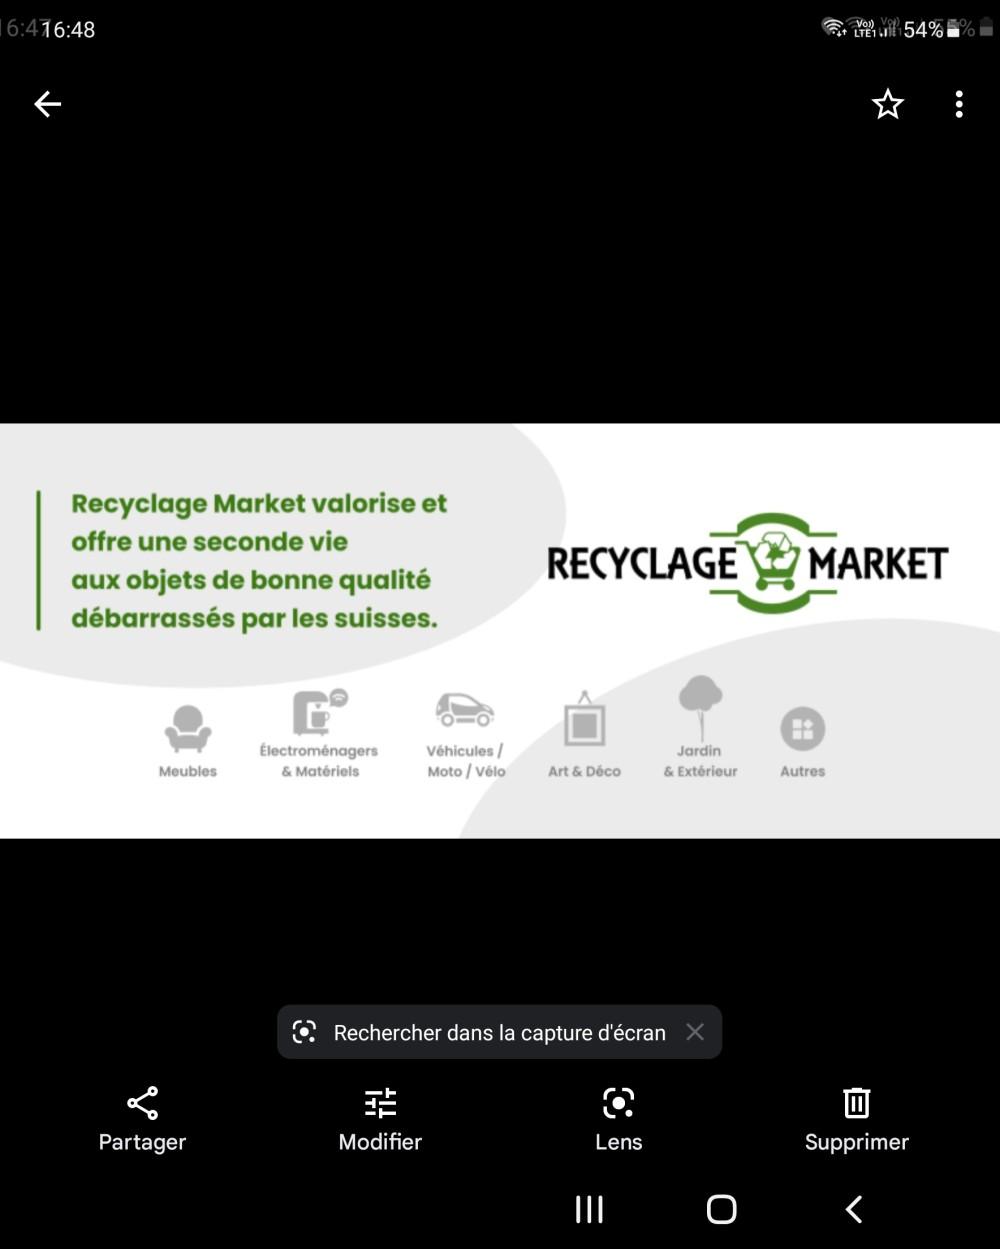 recyclage-market.ch